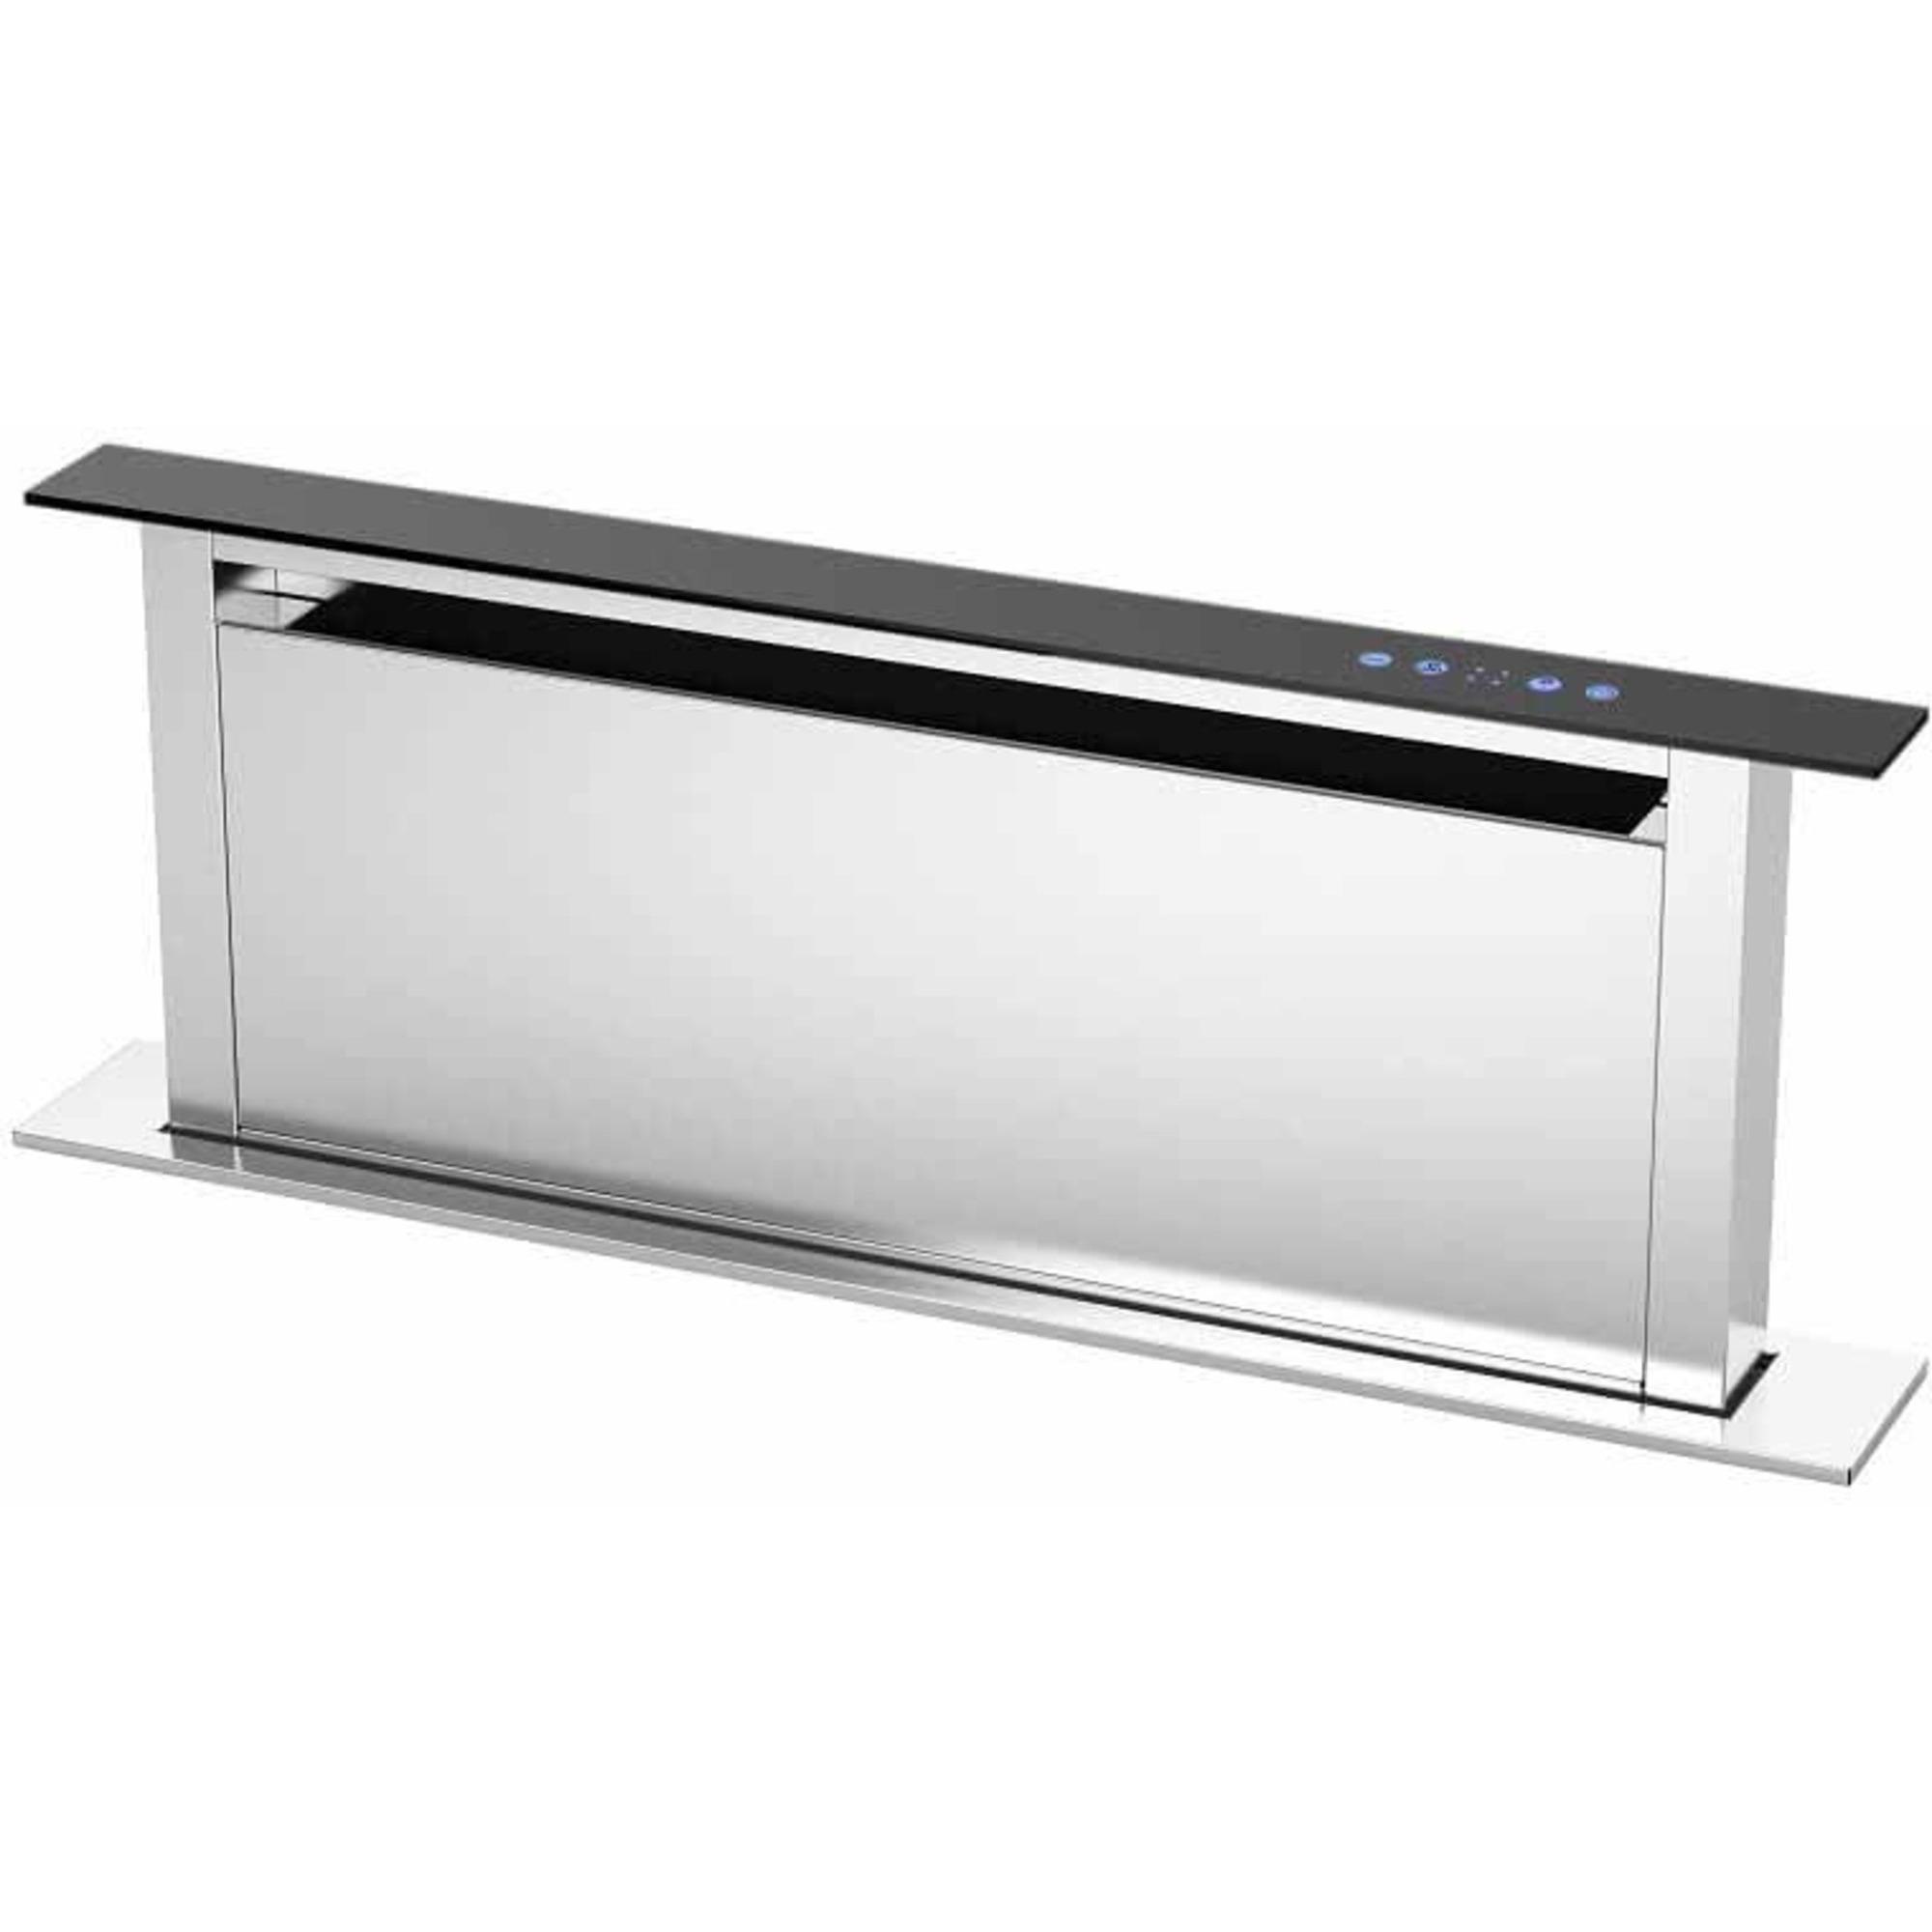 Bertazzoni Integrerad Fläktkåpa KDD90XA 90 cm Design-serien rostfri